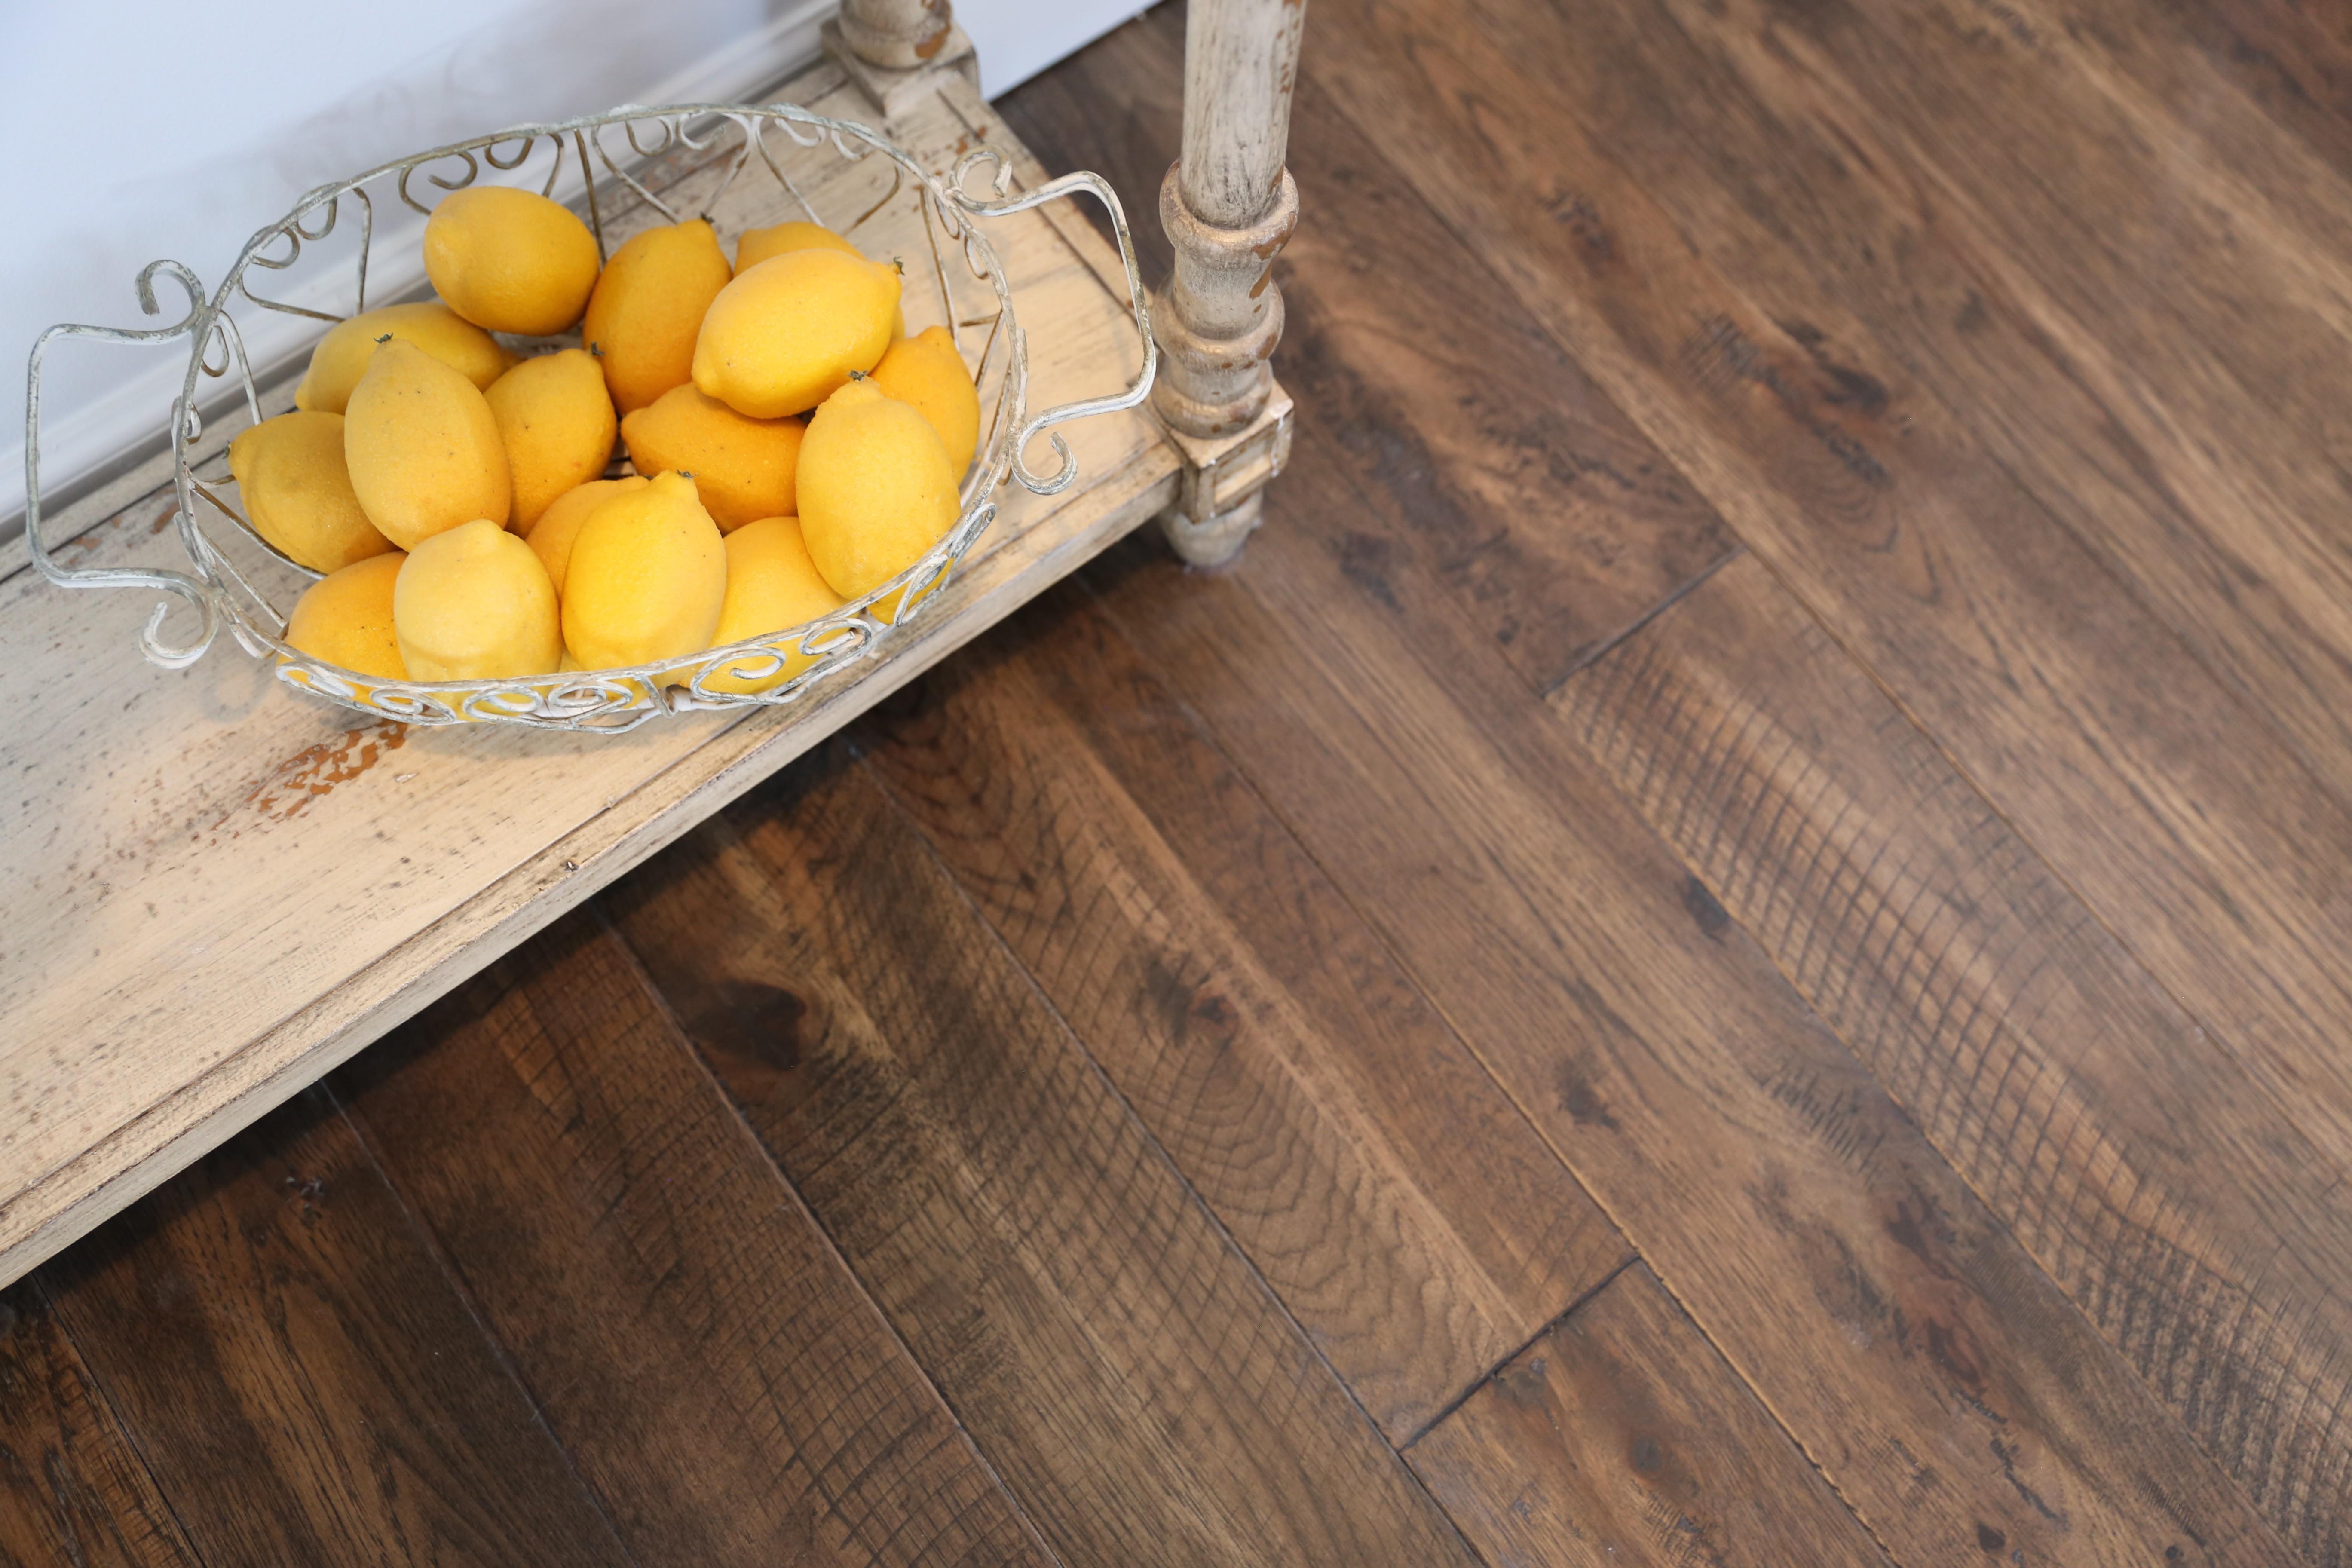 NWFA: National Wood Flooring Association | LinkedIn